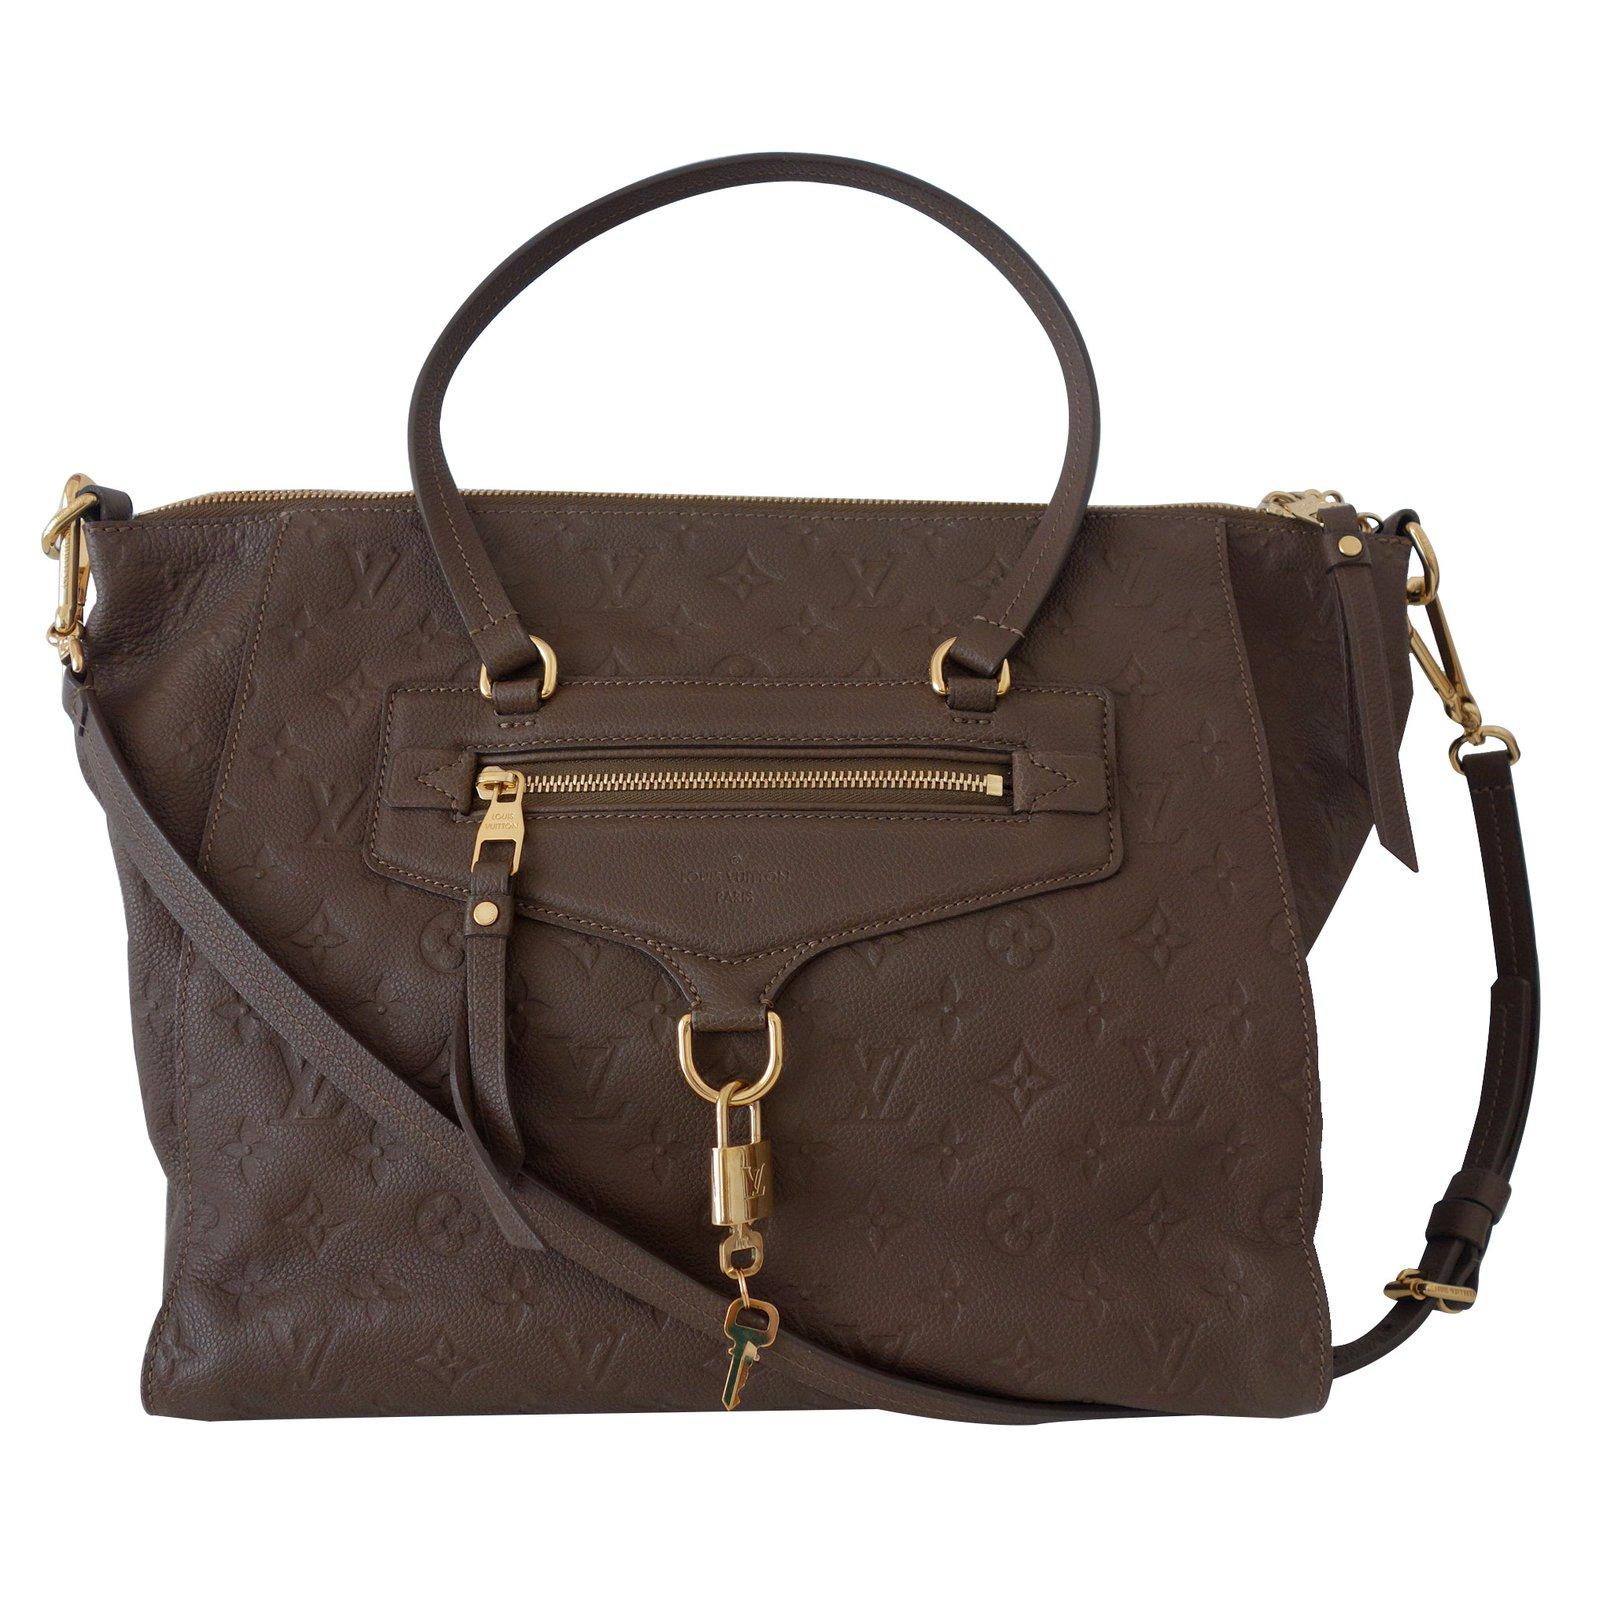 Sacs à main Louis Vuitton SAC VUITTON EMPREINTE LUMINEUSE Cuir Marron  ref.10764 de731d0e4d4